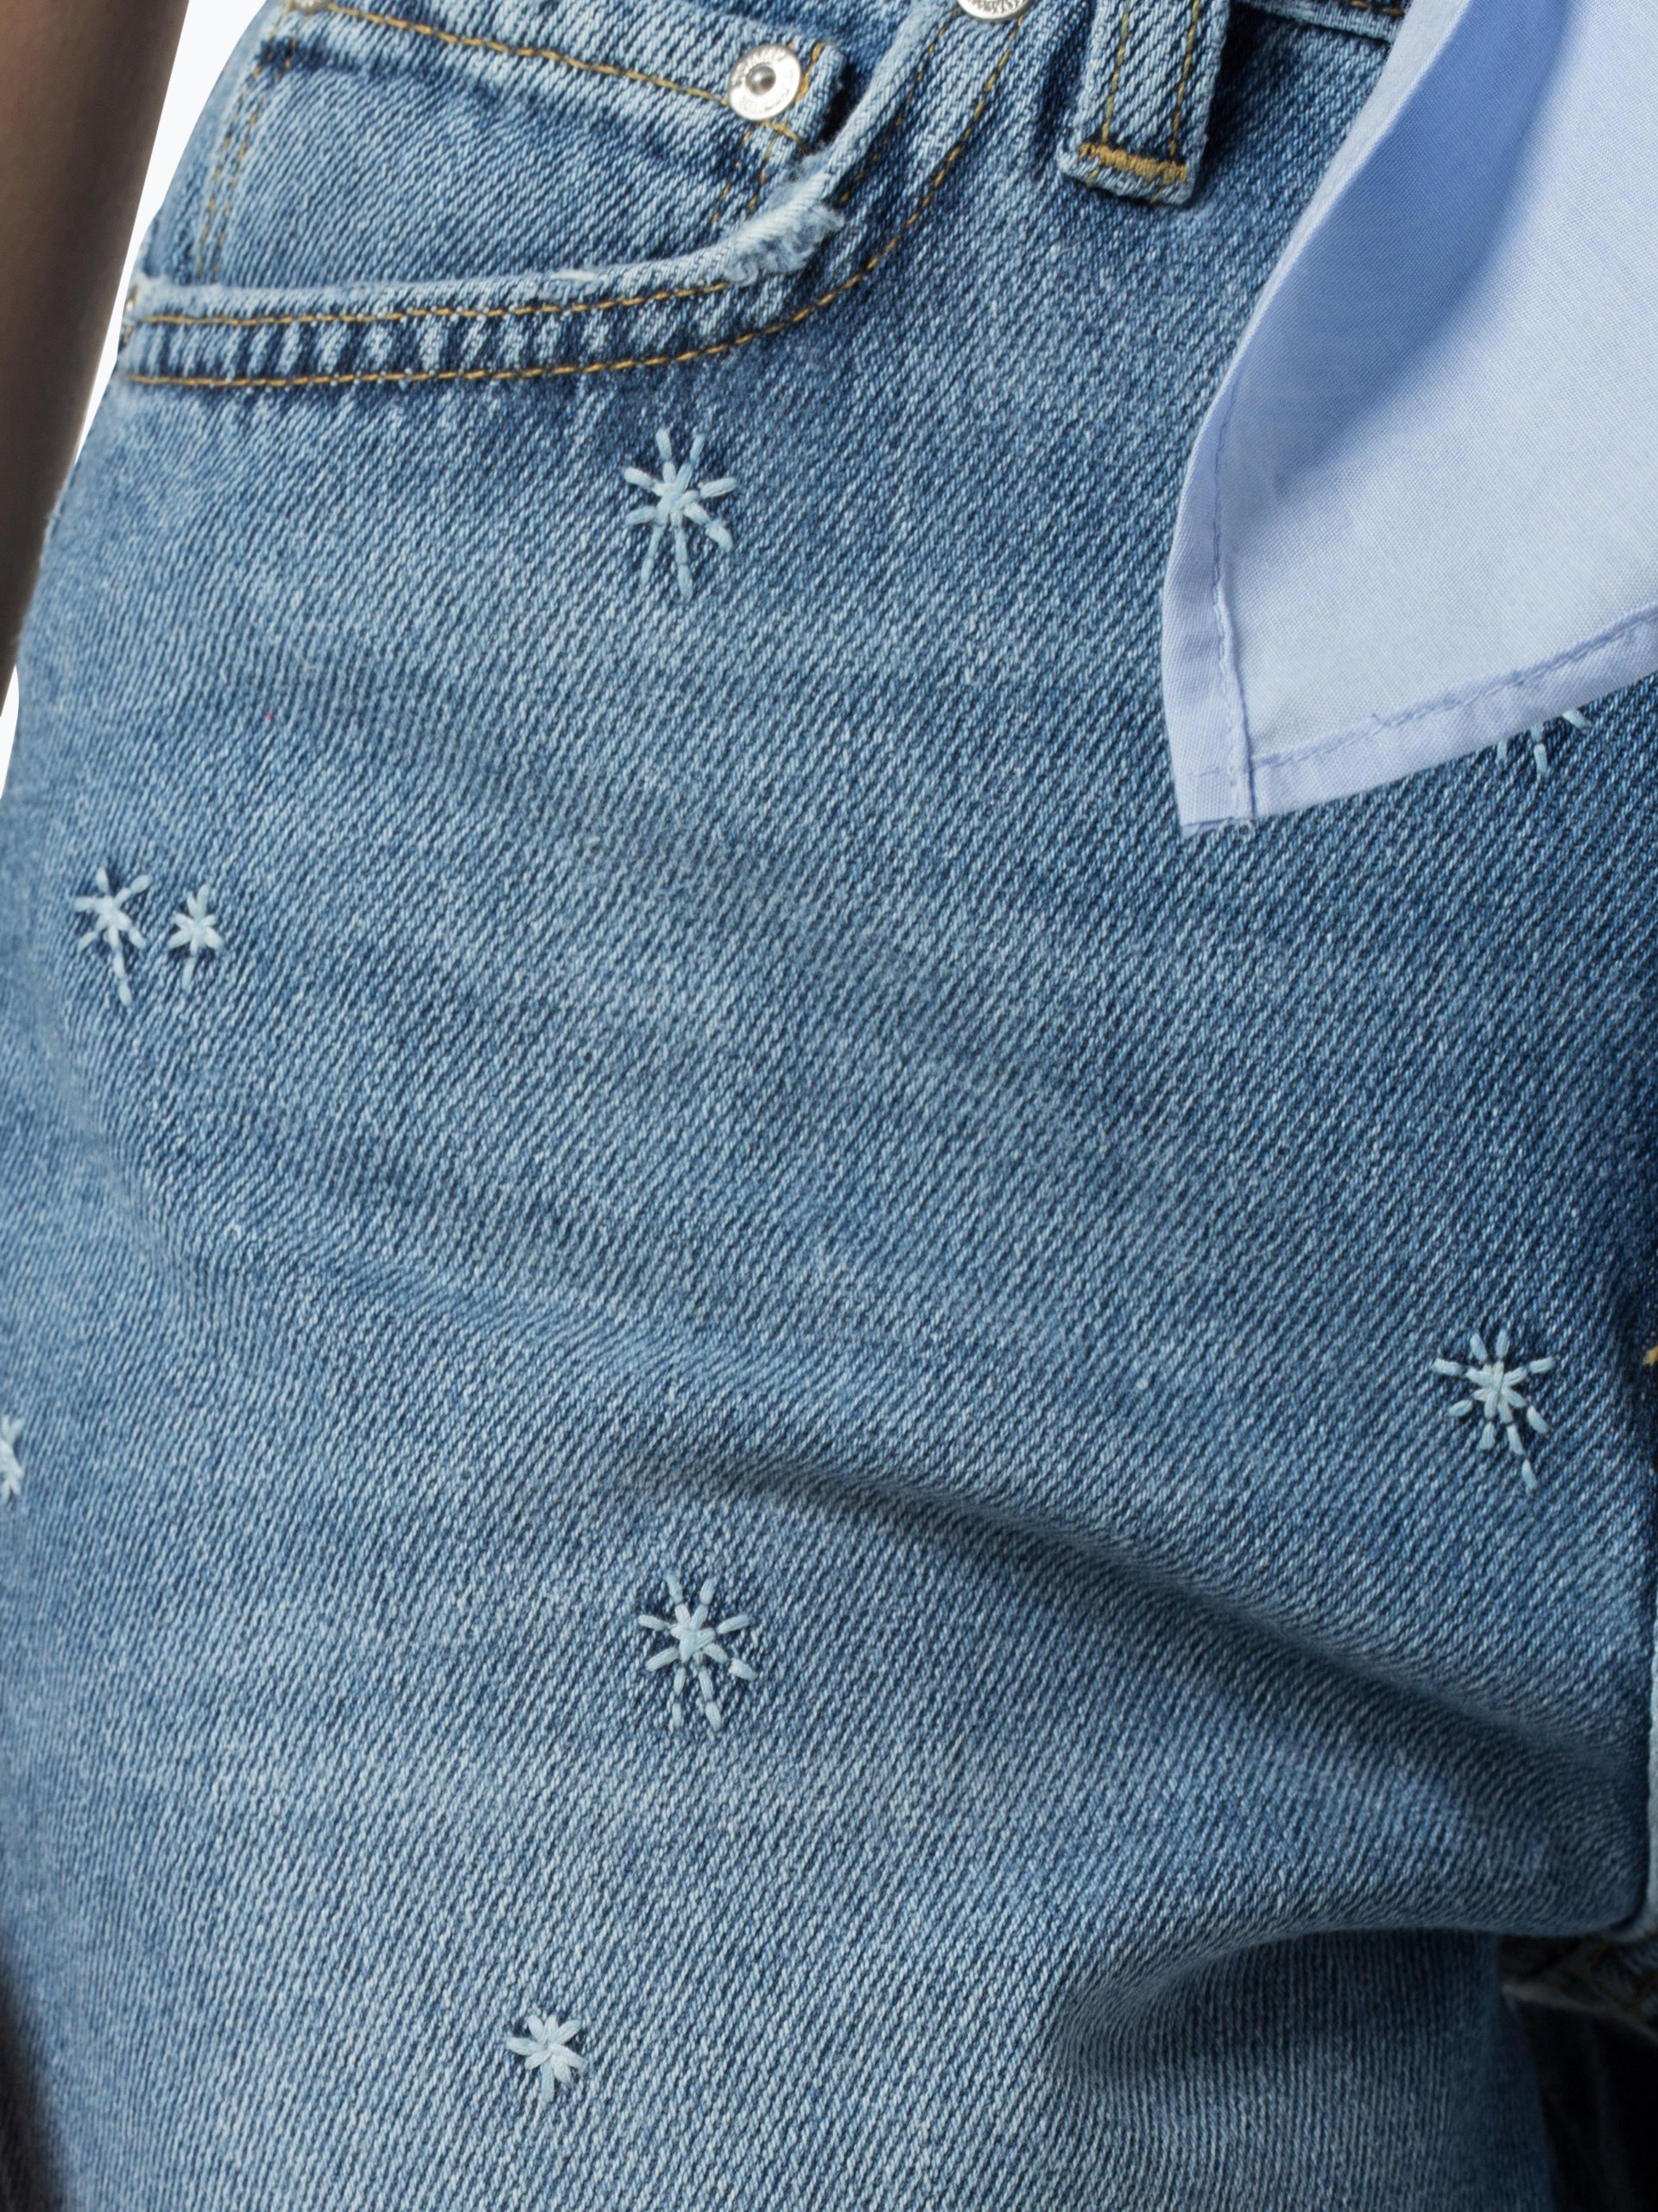 tommy hilfiger damen jeans gramercy hellblau blau uni. Black Bedroom Furniture Sets. Home Design Ideas